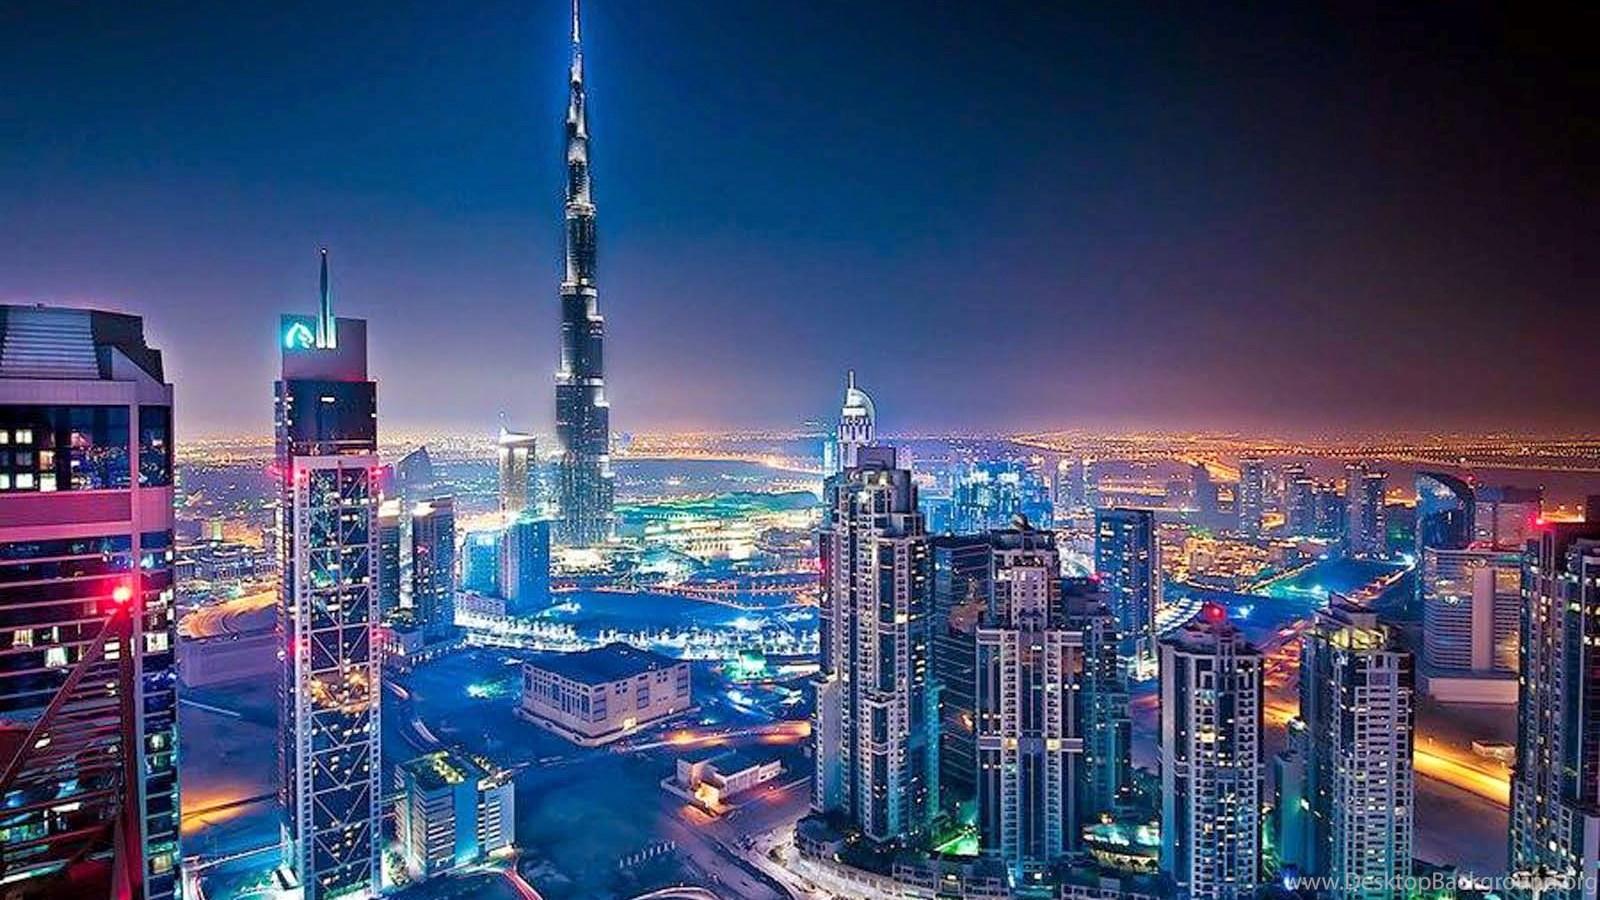 Burj Khalifa Hd Photos: Burj Khalifa In Night HD Wallpapers Desktop Background